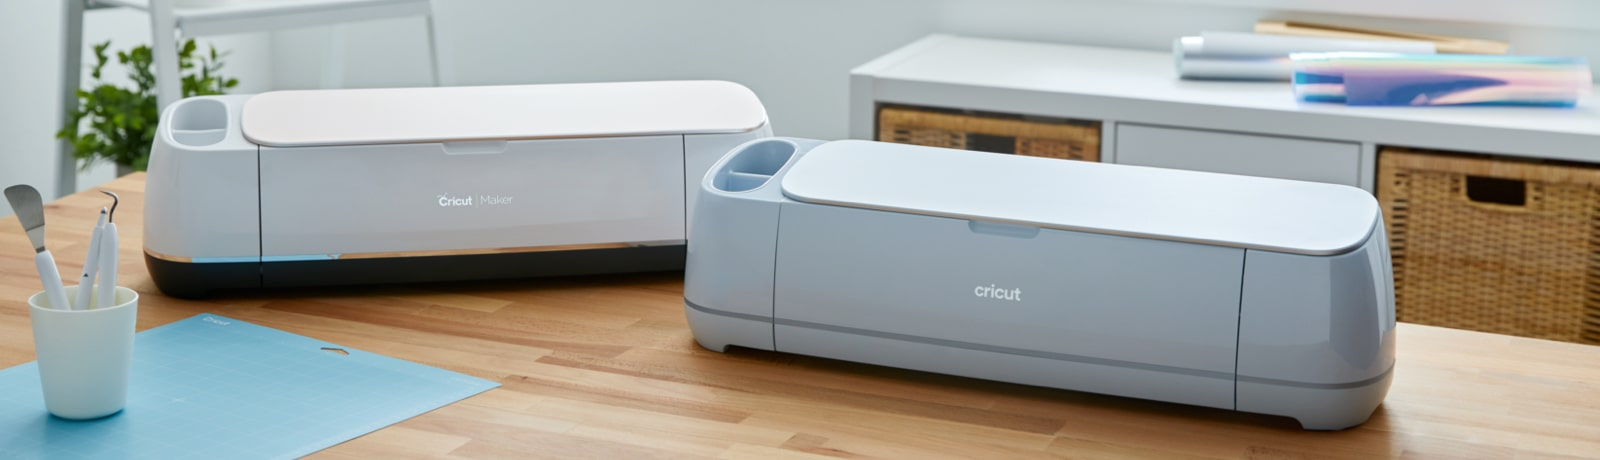 Cricut Maker Family Machines